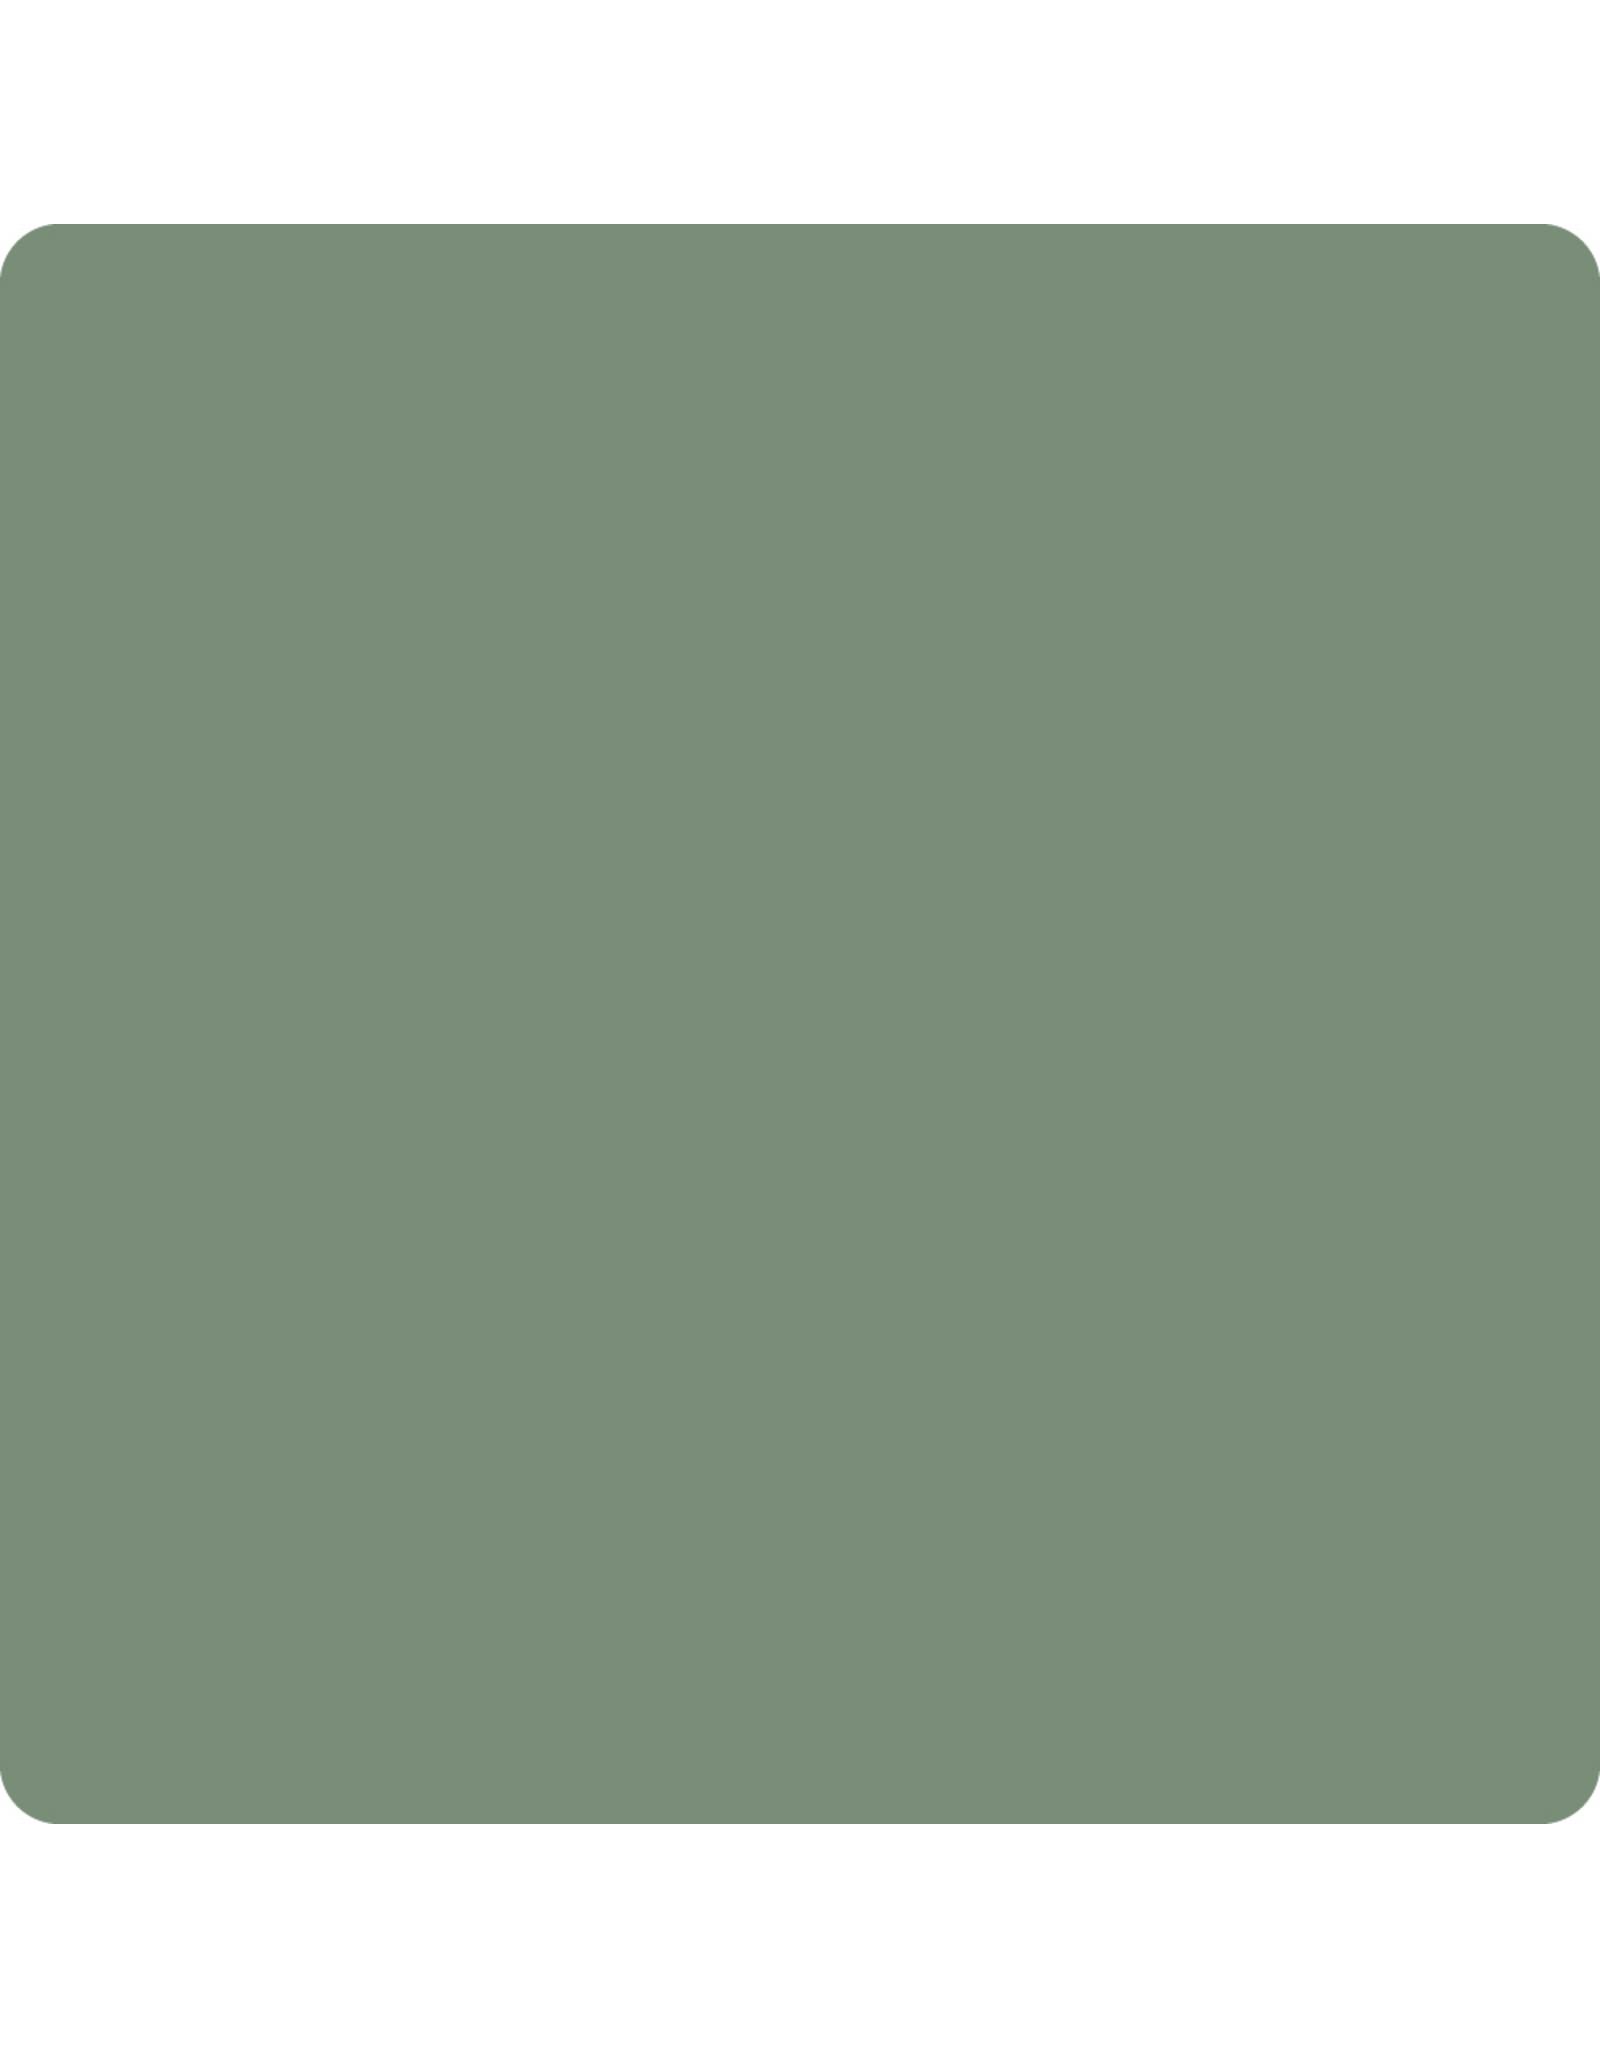 Wise Owl Paint Chalk Synthesis Paint-Foxtrot